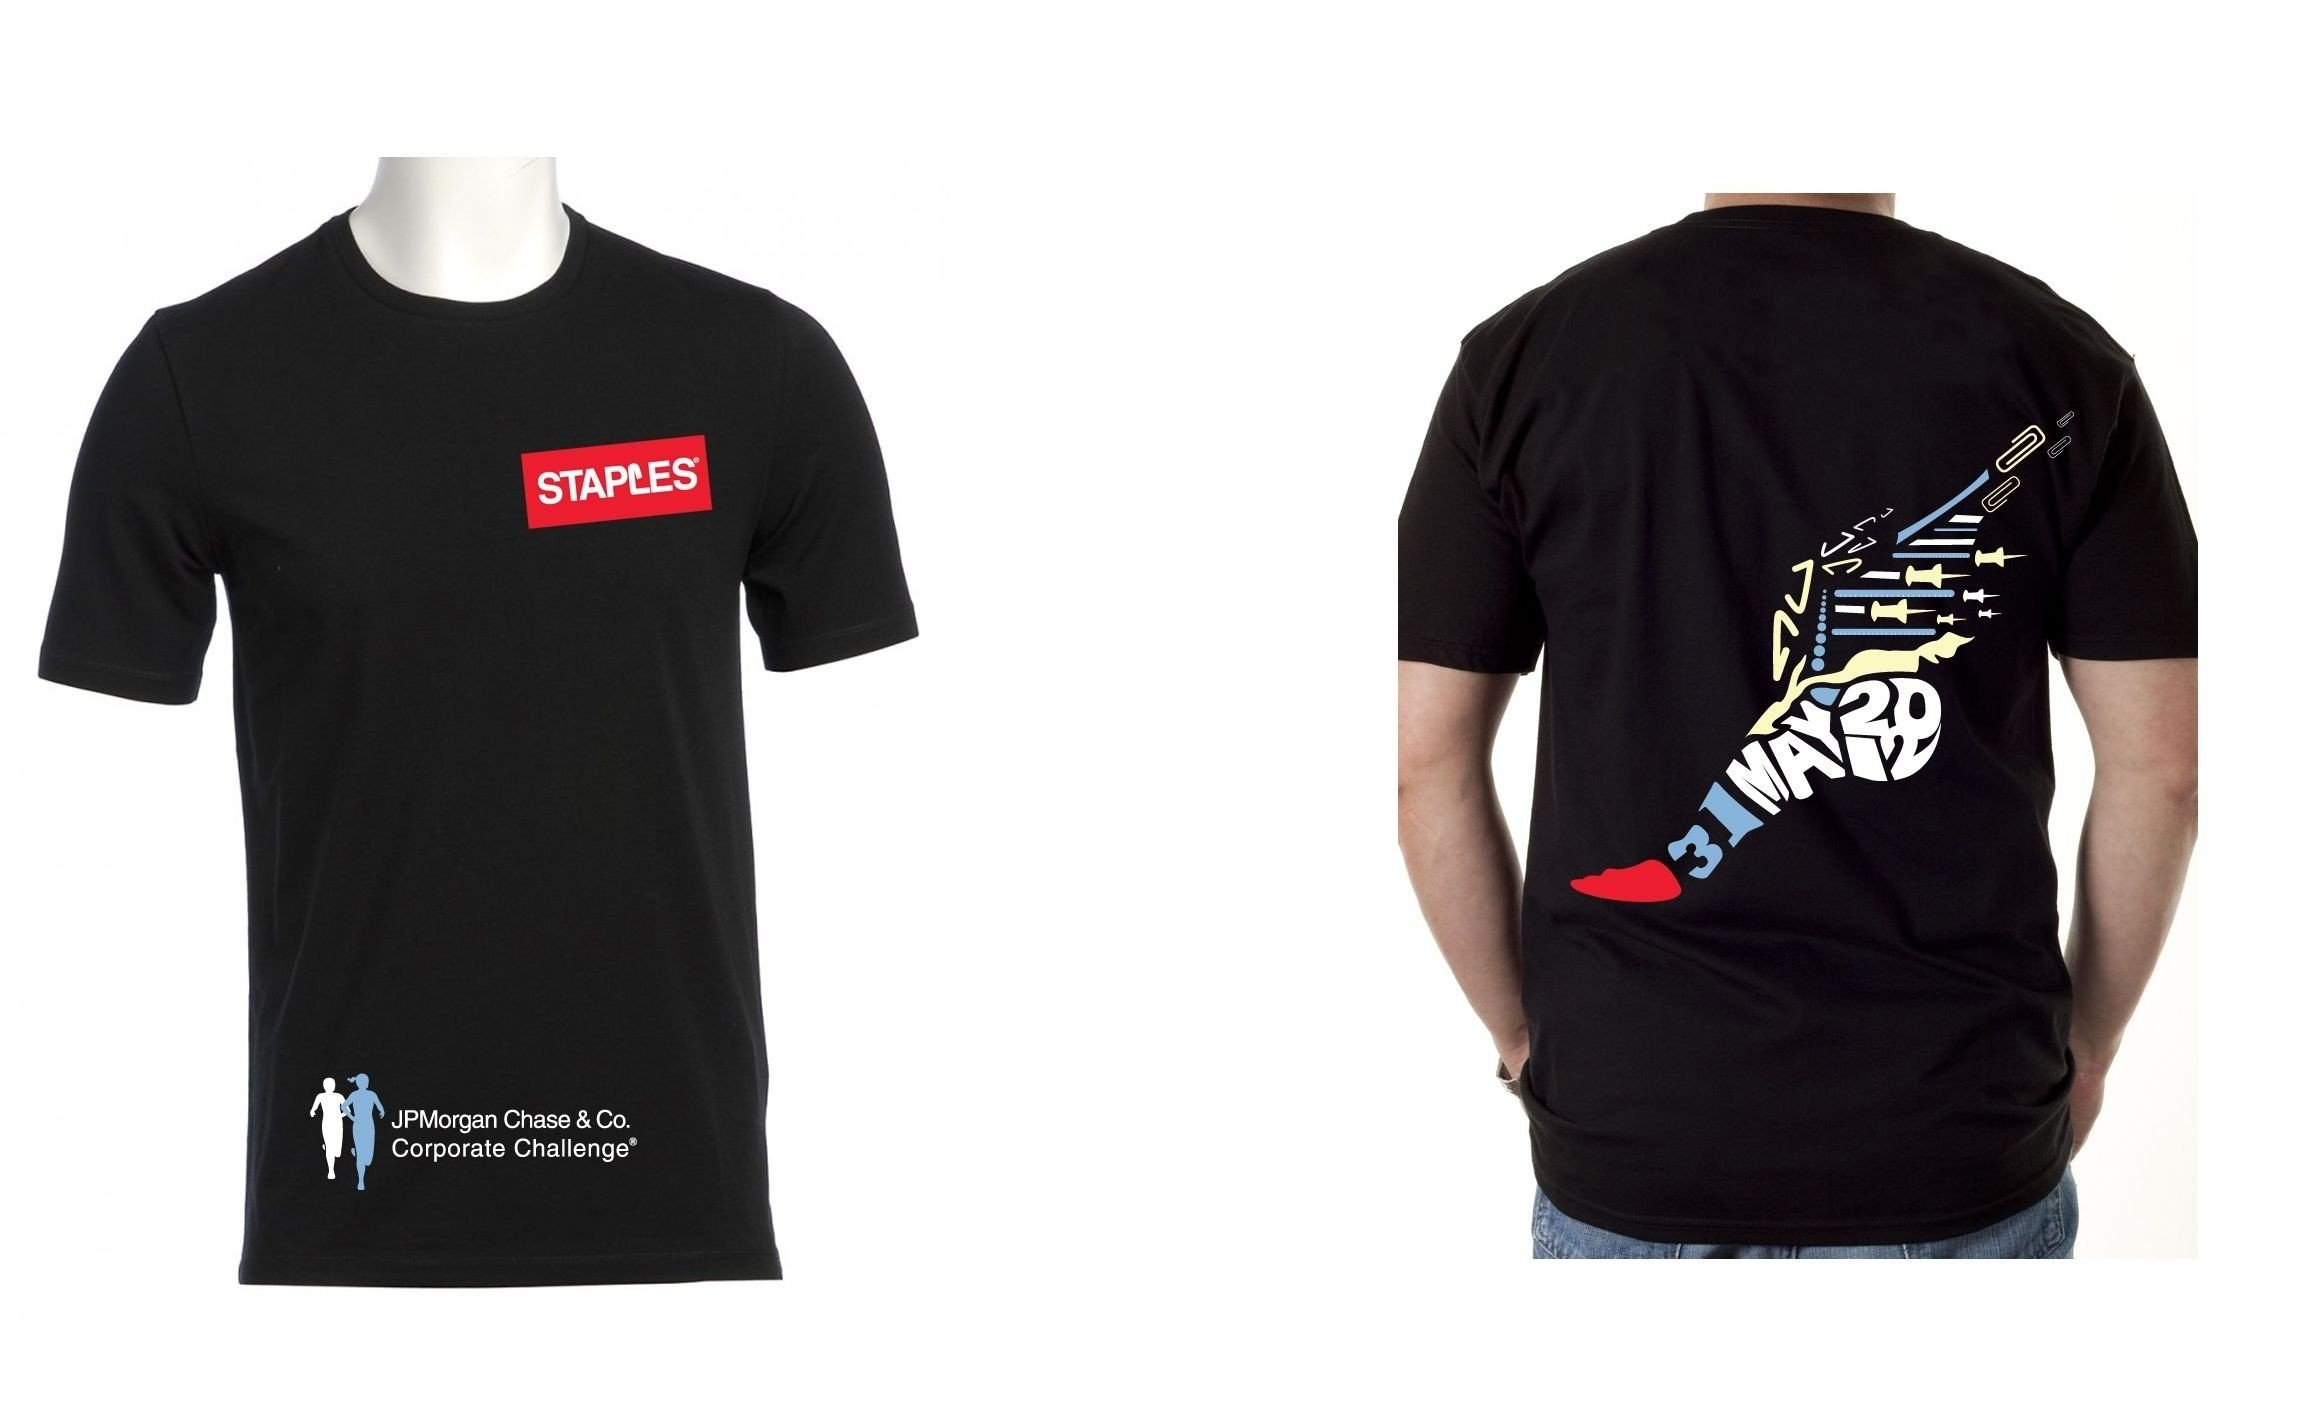 10 Perfect Company T Shirt Design Ideas company t shirt design ideas 2021